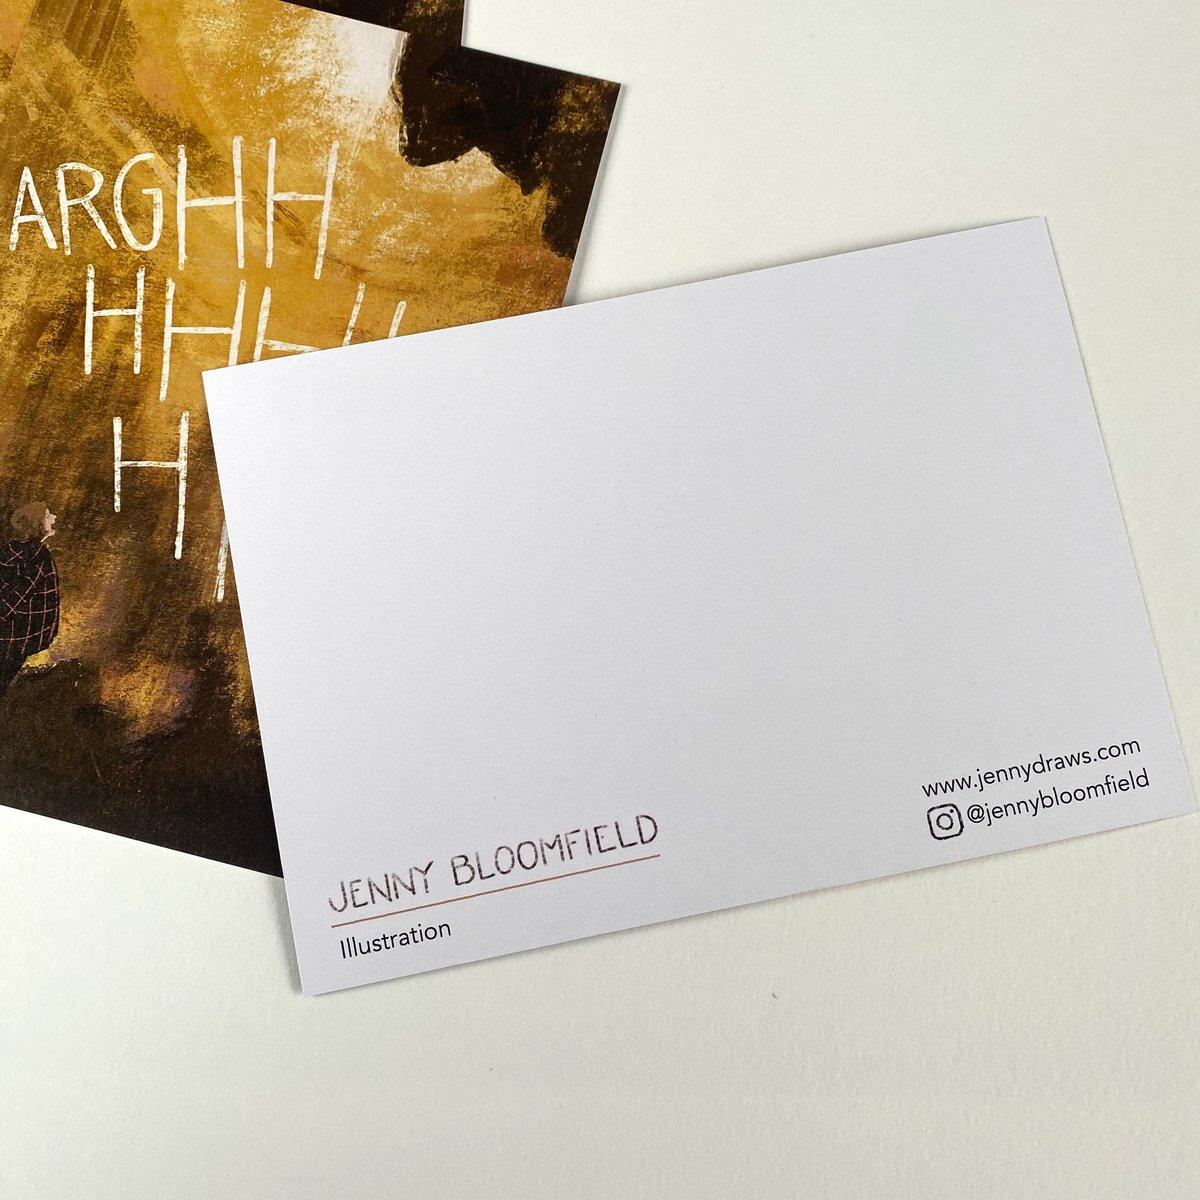 Image of 'ARGHHHHHHHHH!' Postcard - single or multipack